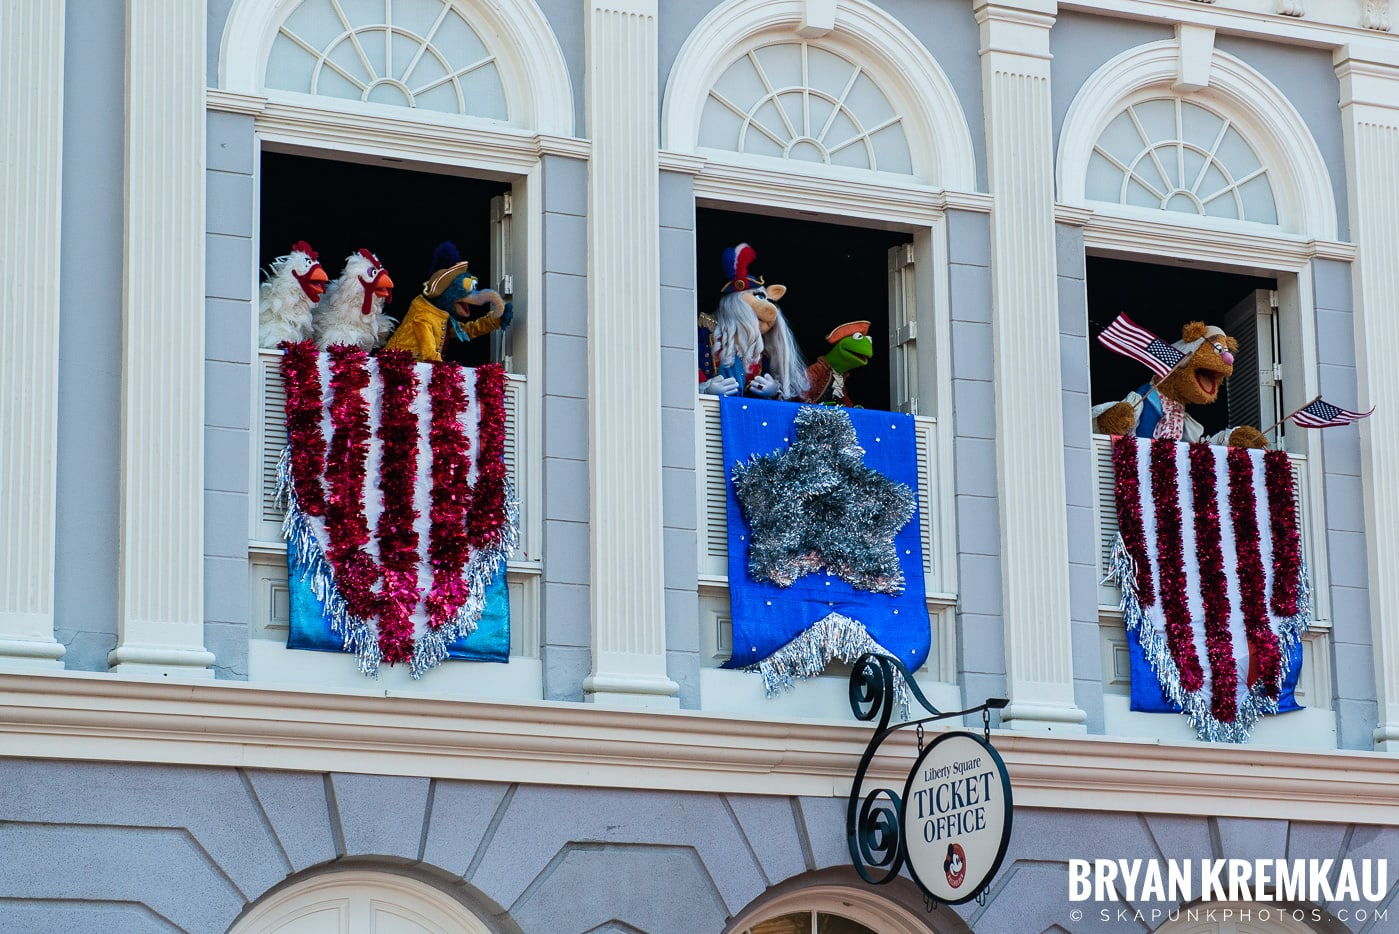 Walt Disney World Vacation: Days 1 & 2 (Disney Springs & Magic Kingdom, Epcot) September 29th - 30th 2019 (19)